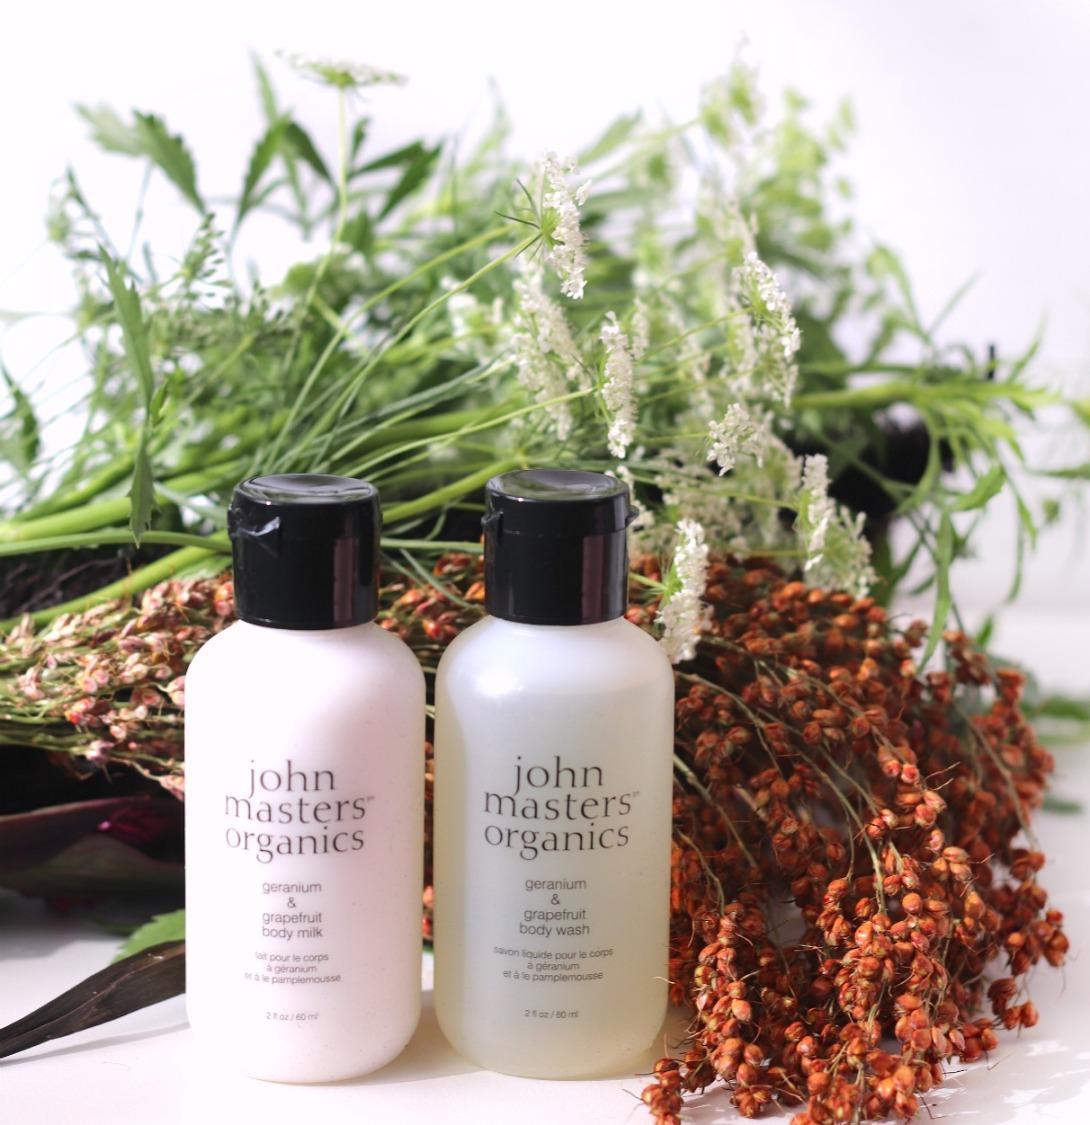 Glossybox October 2019 John Masters Organics body milk and body wash ayob